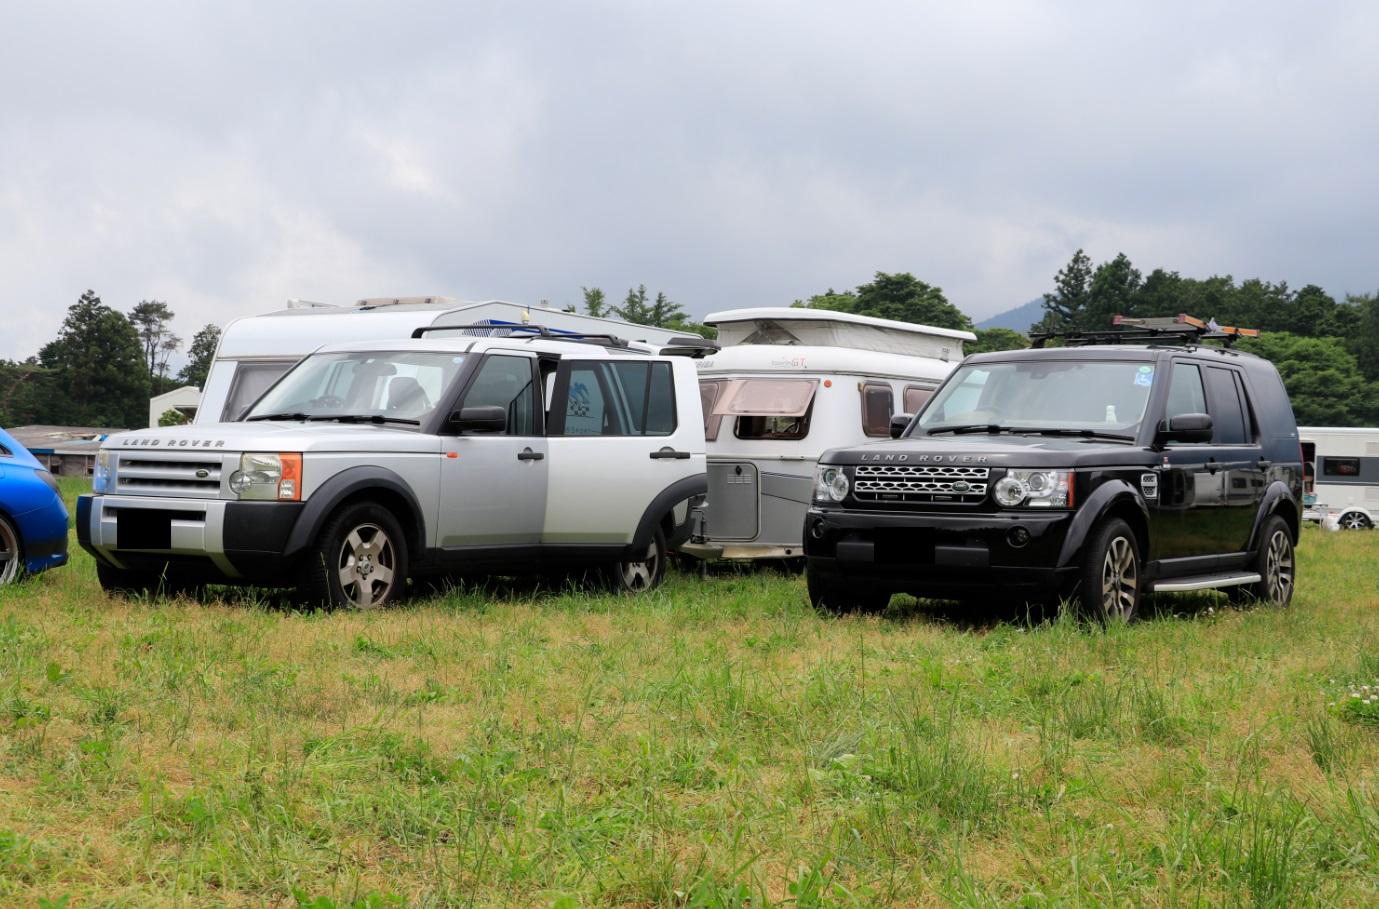 towing caravan with land rover, 4th range rover vogue, range rover evoque, land rover discovery3, land rover discovery4, land rover discovery5, new defender110, 4th range, evoque, discovery3, discovery4, discovery5, new defender, defender 110, lr3, lr4, lr5, camping trailer, caravan, trailer, towing car, tow car, land rover, range rover, discovery, ランドローバーでキャラバンを牽引, ランドローバーでトレーラーを牽引, 4thレンジローバーヴォーグ, レンジローバーイヴォーク, ランドローバーディスカバリー3, ランドローバーディスカバリー4, ランドローバーディスカバリー5, 新型ディフェンダー110, 新型ディフェンダー, 4thレンジローバー, イヴォーク, ディスカバリー, ディスカバリー3, ディスカバリー4, ディスカバリー5, キャンピングトレーラー, キャラバン, トレーラー, 牽引車, 牽引走行, レンジローバー, ランドローバー,